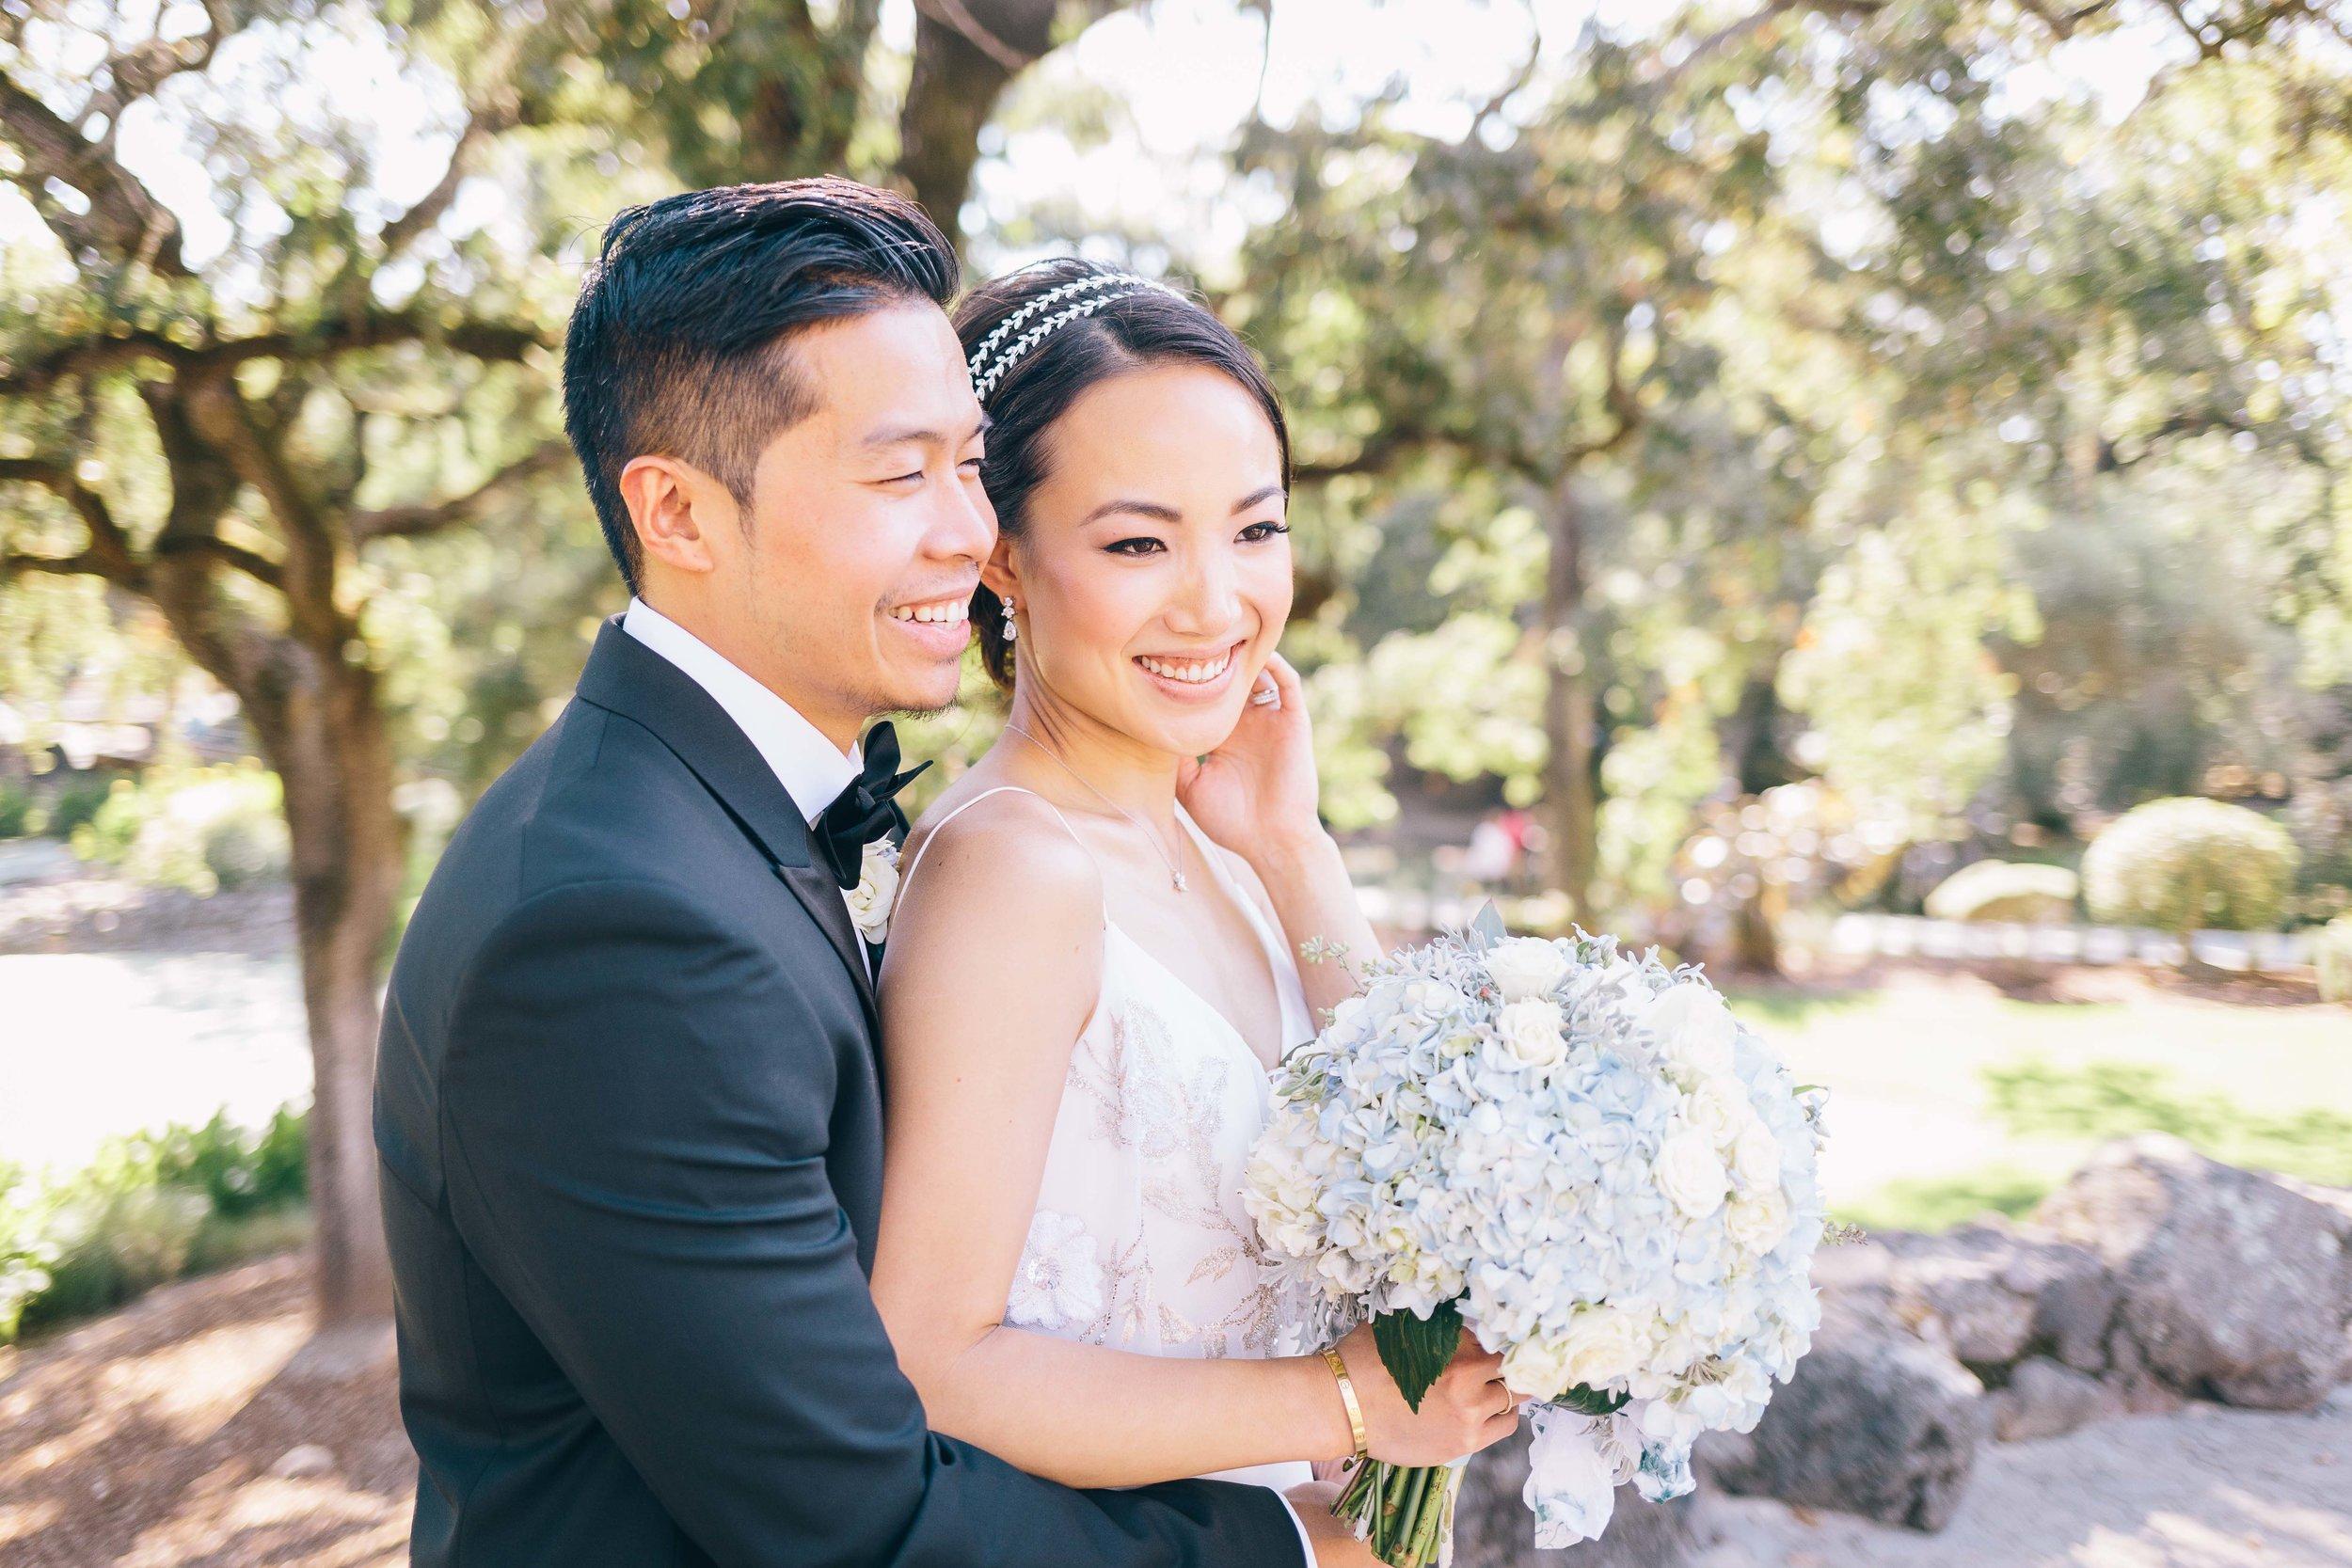 Westin Verasa Wedding at La Toque - JBJ Pictures Wedding Photographer in Napa Sonoma and San Francisco - 1 (13).jpg